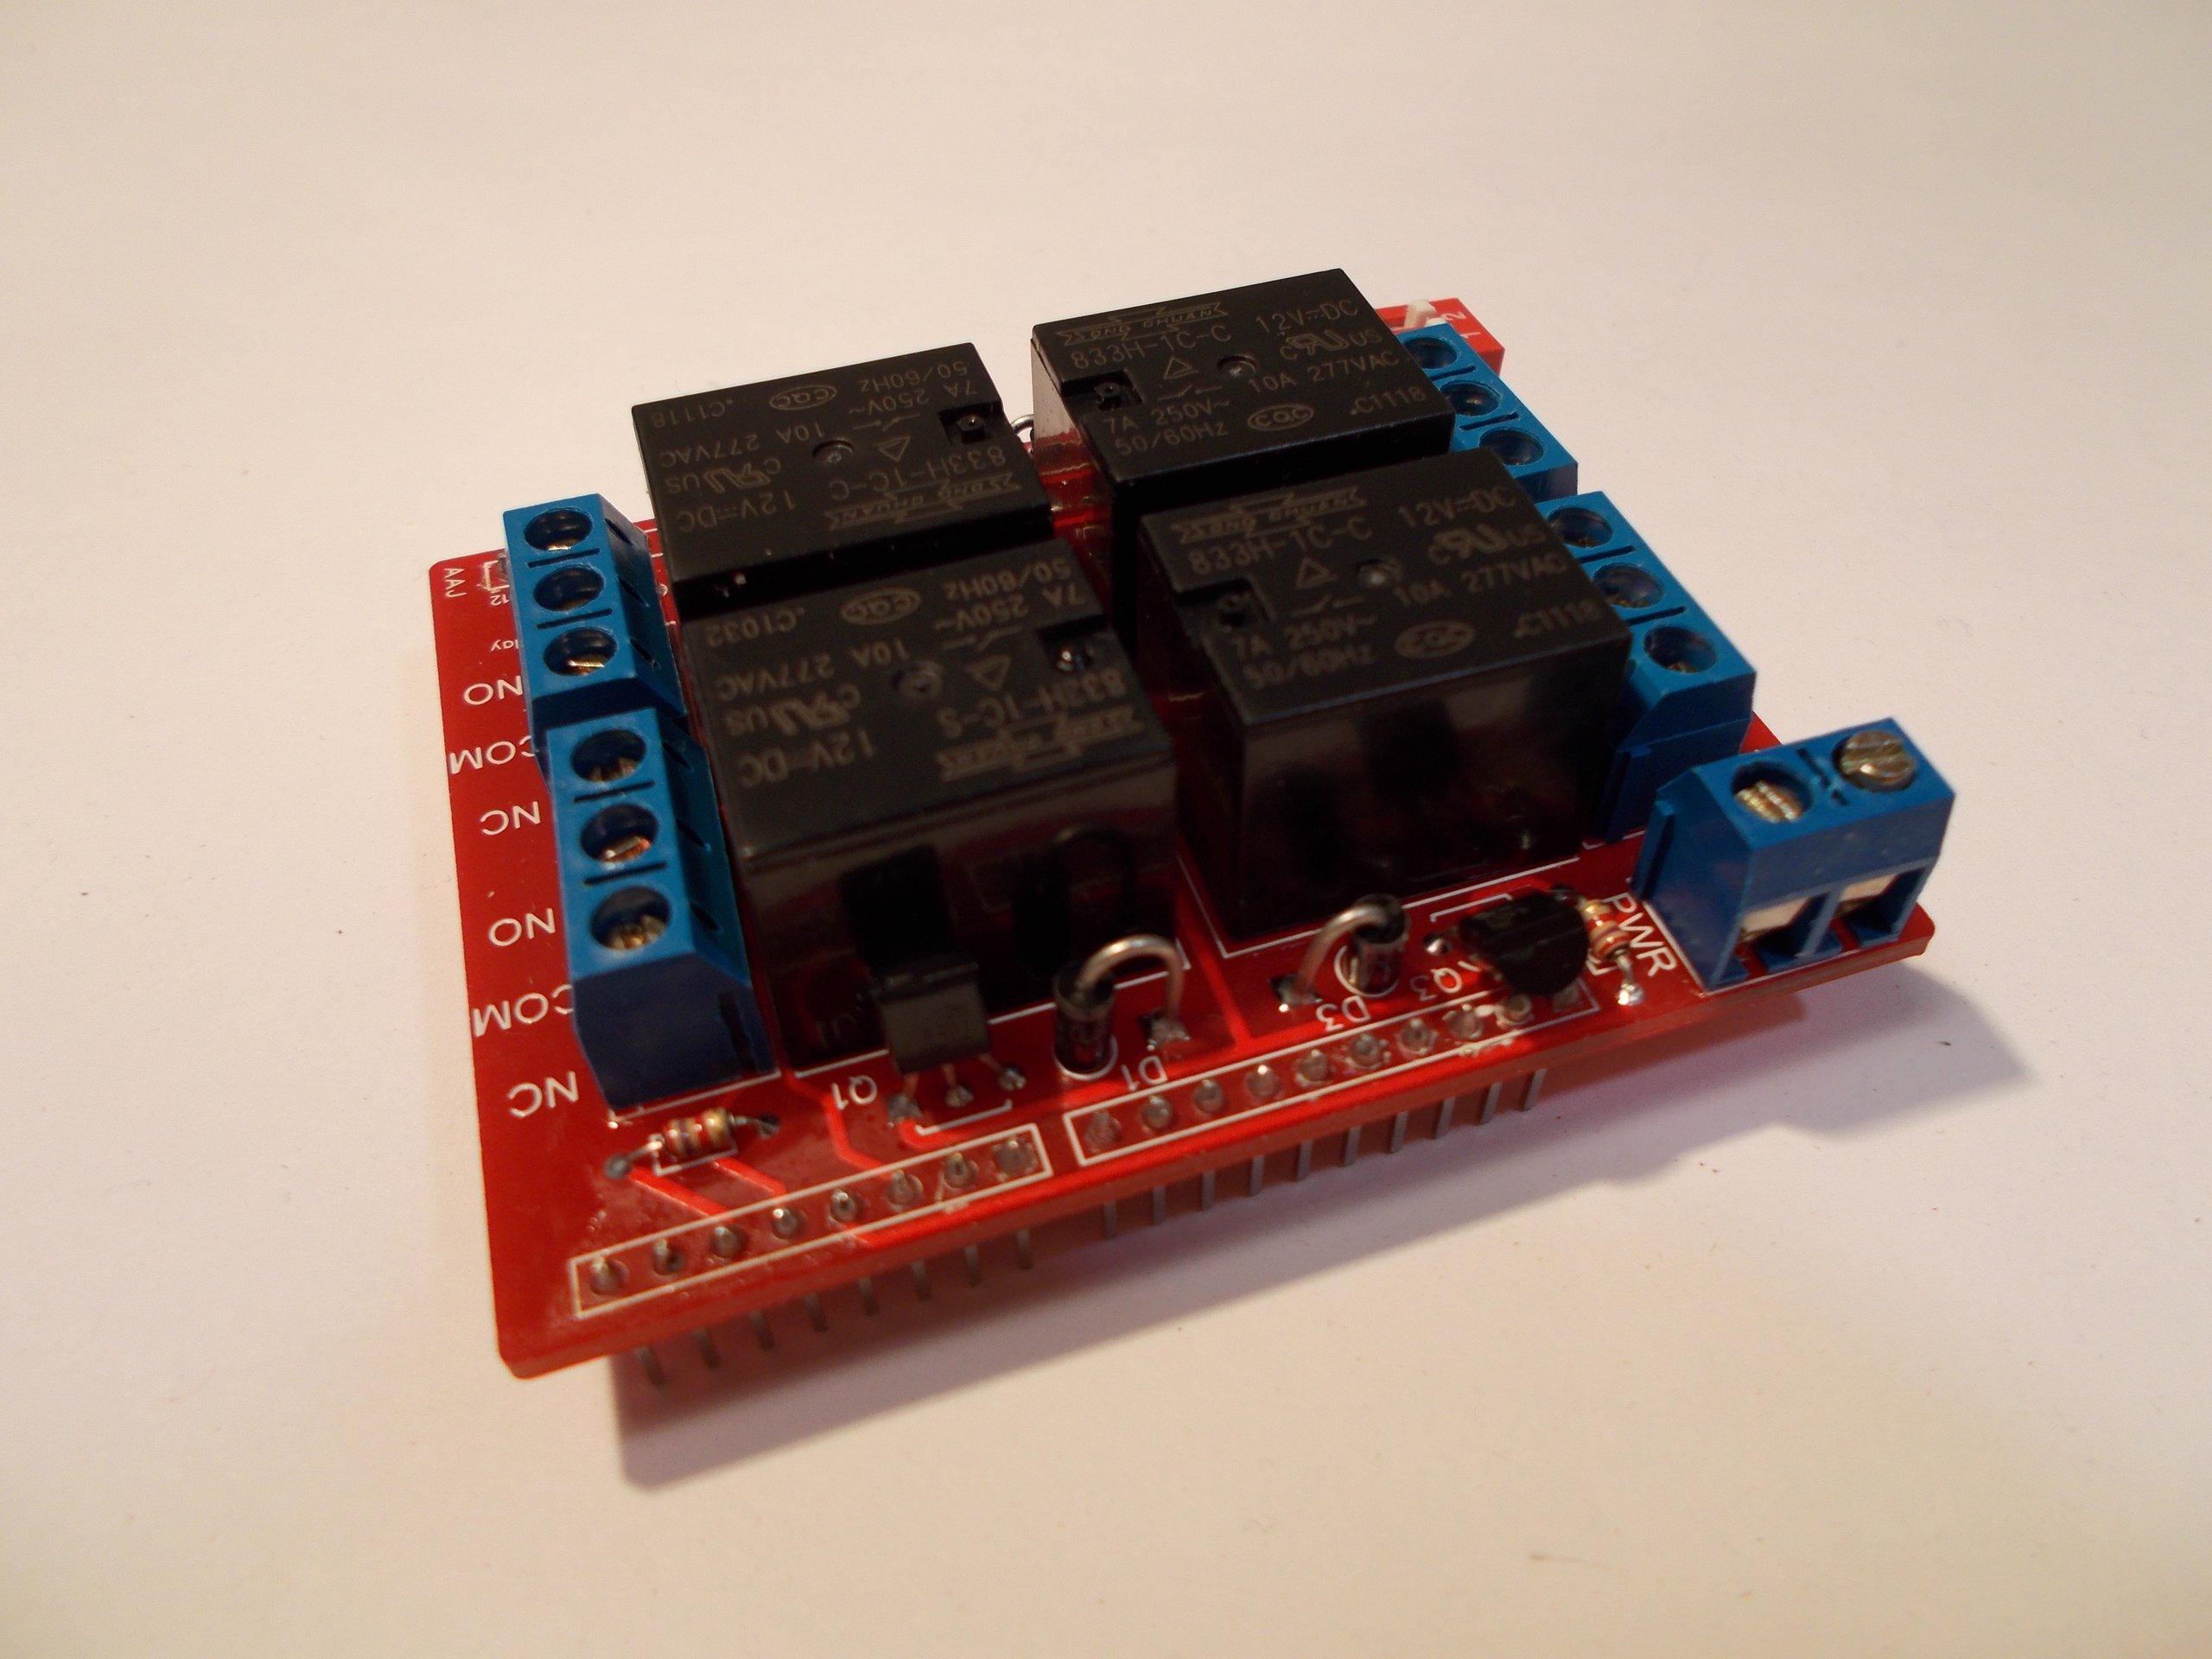 Arduino relay shield kit v from nfceramics on tindie